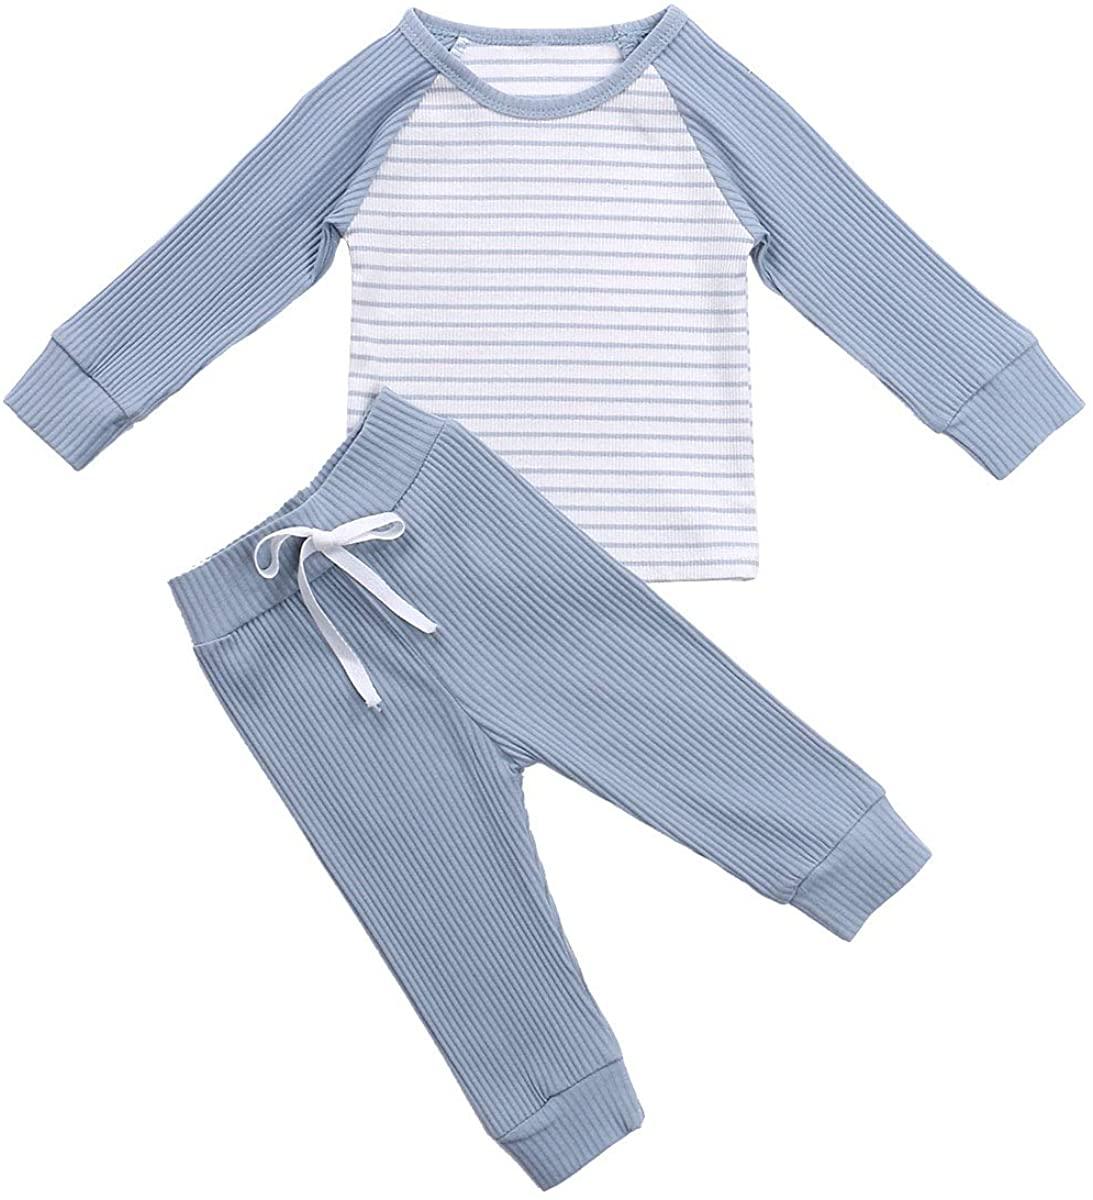 2Pcs/Set Newborn Baby Boys Long Sleeve Top T-Shirt Stripe Long Pants 2Pcs Cotton Pajamas Casual Outfits